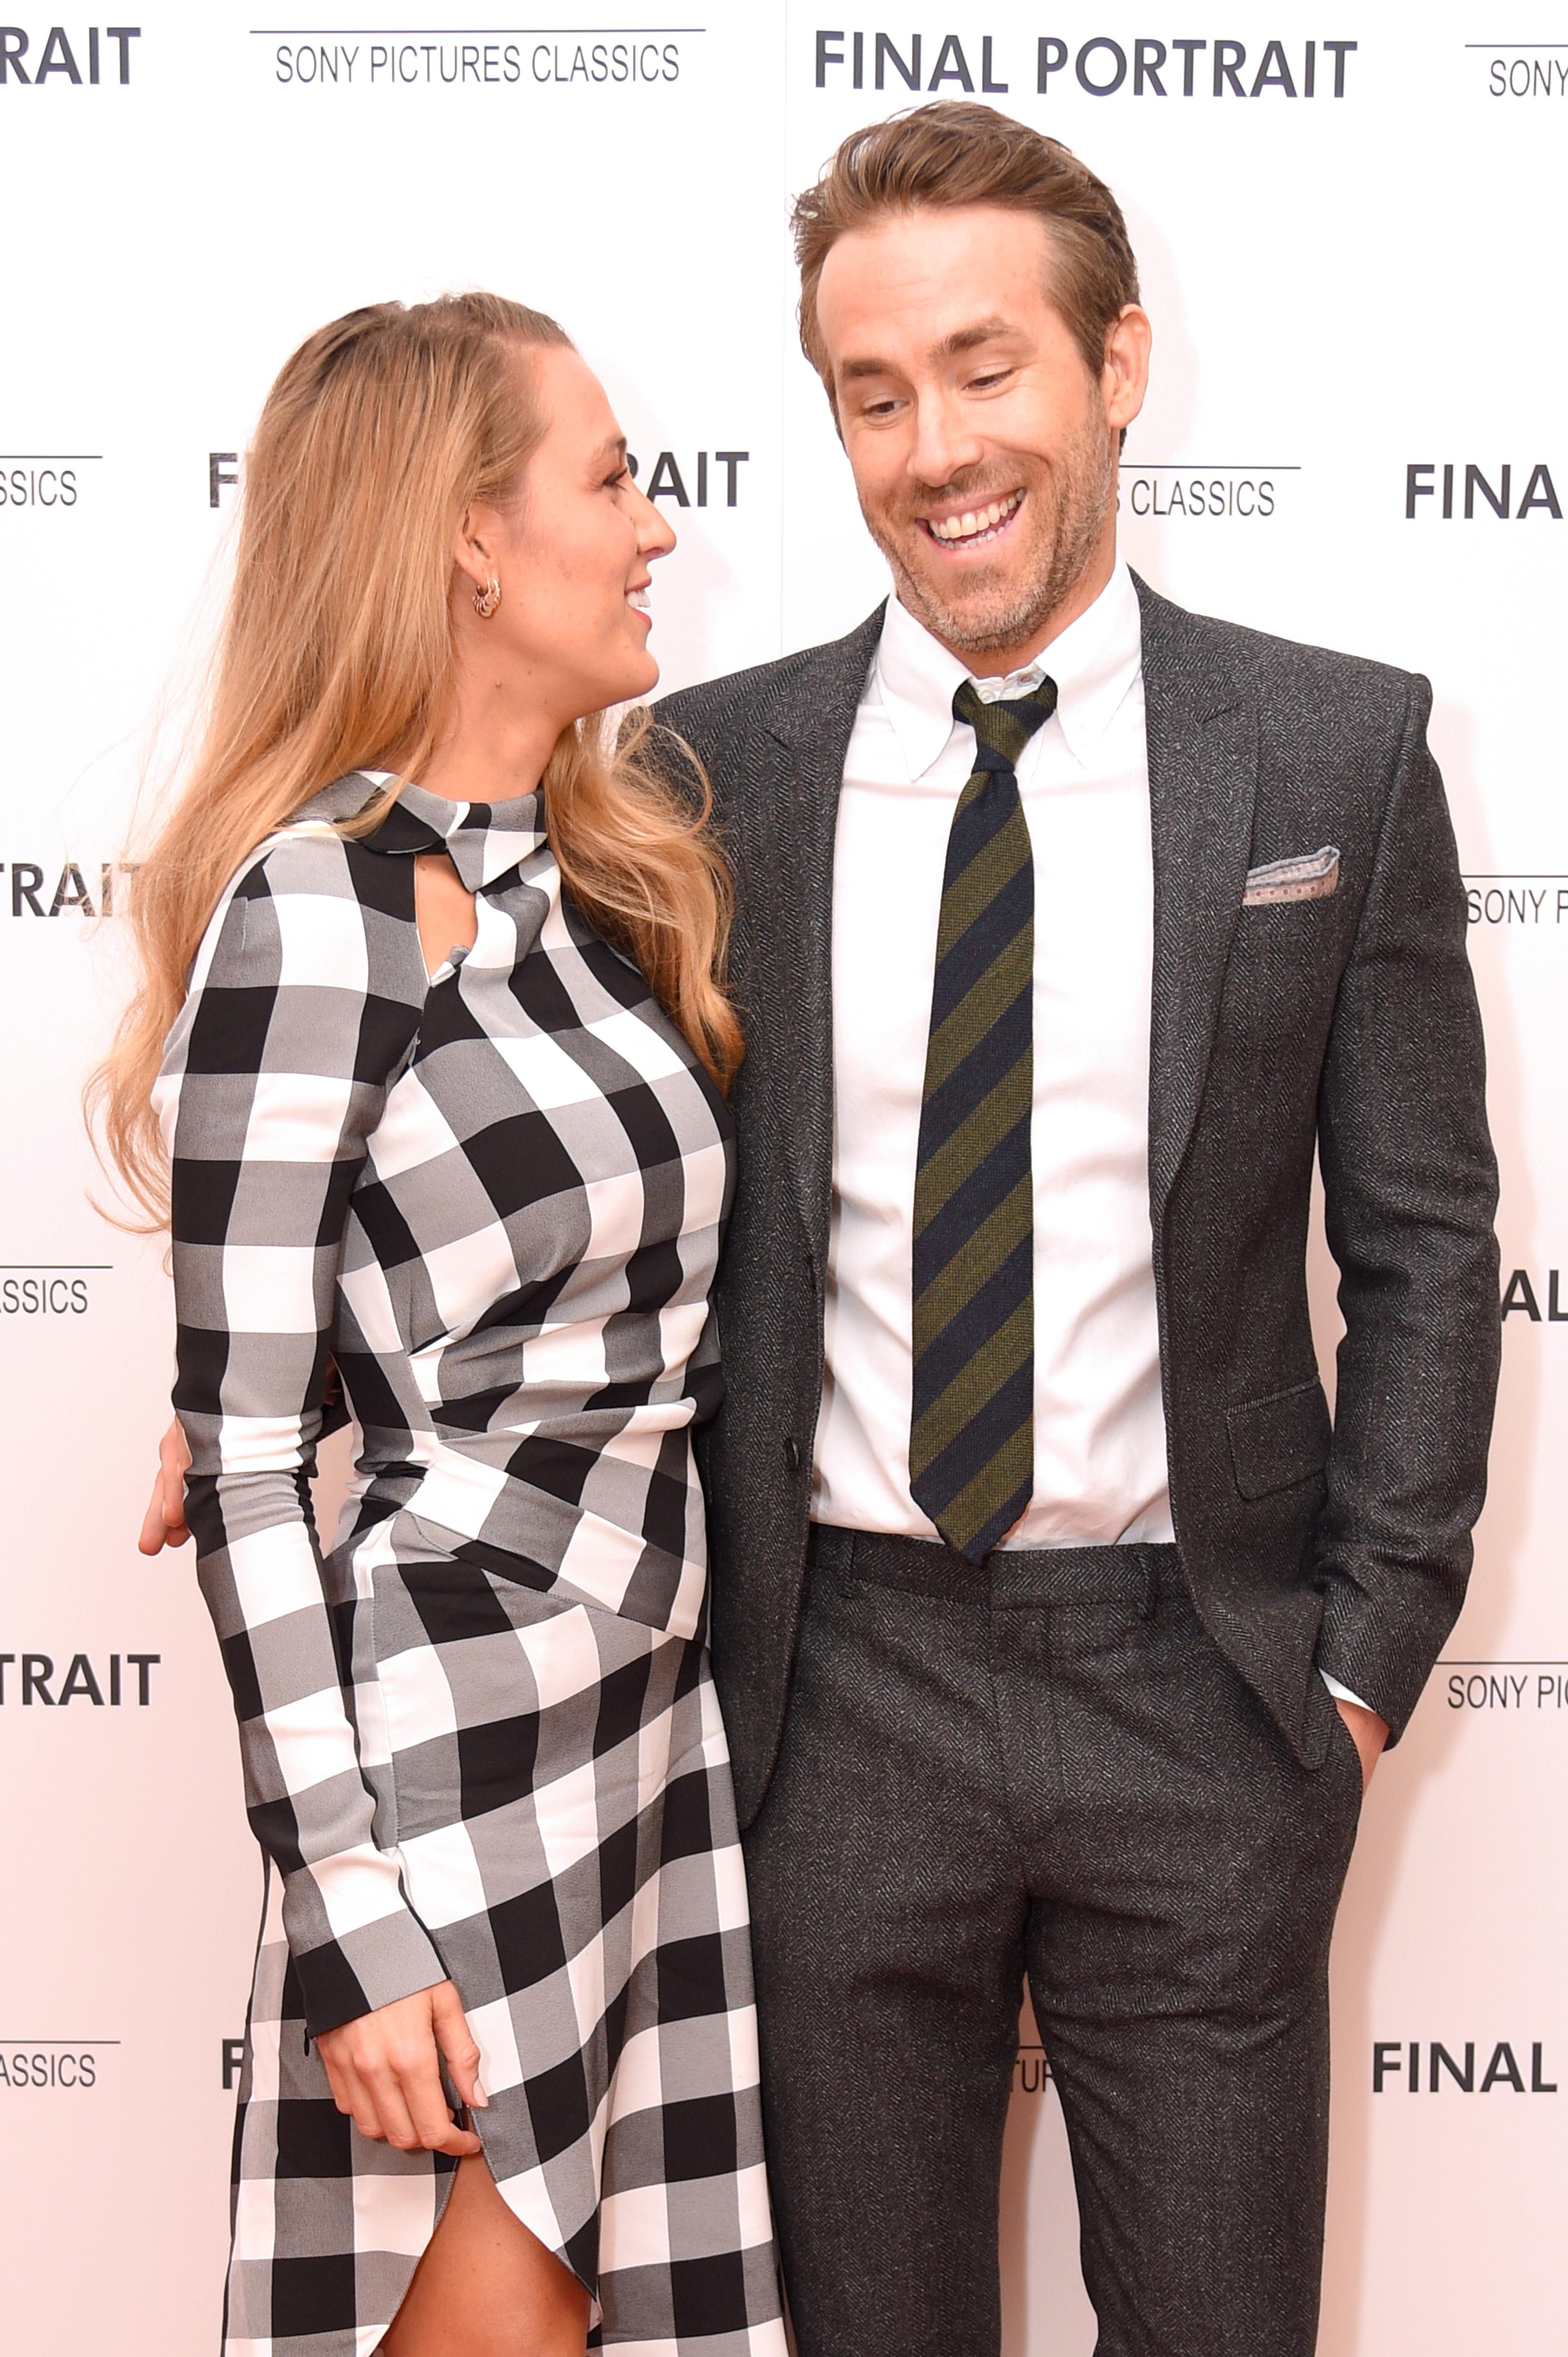 Blake Lively Trolls Ryan Reynolds With Romantic Red Carpet ...